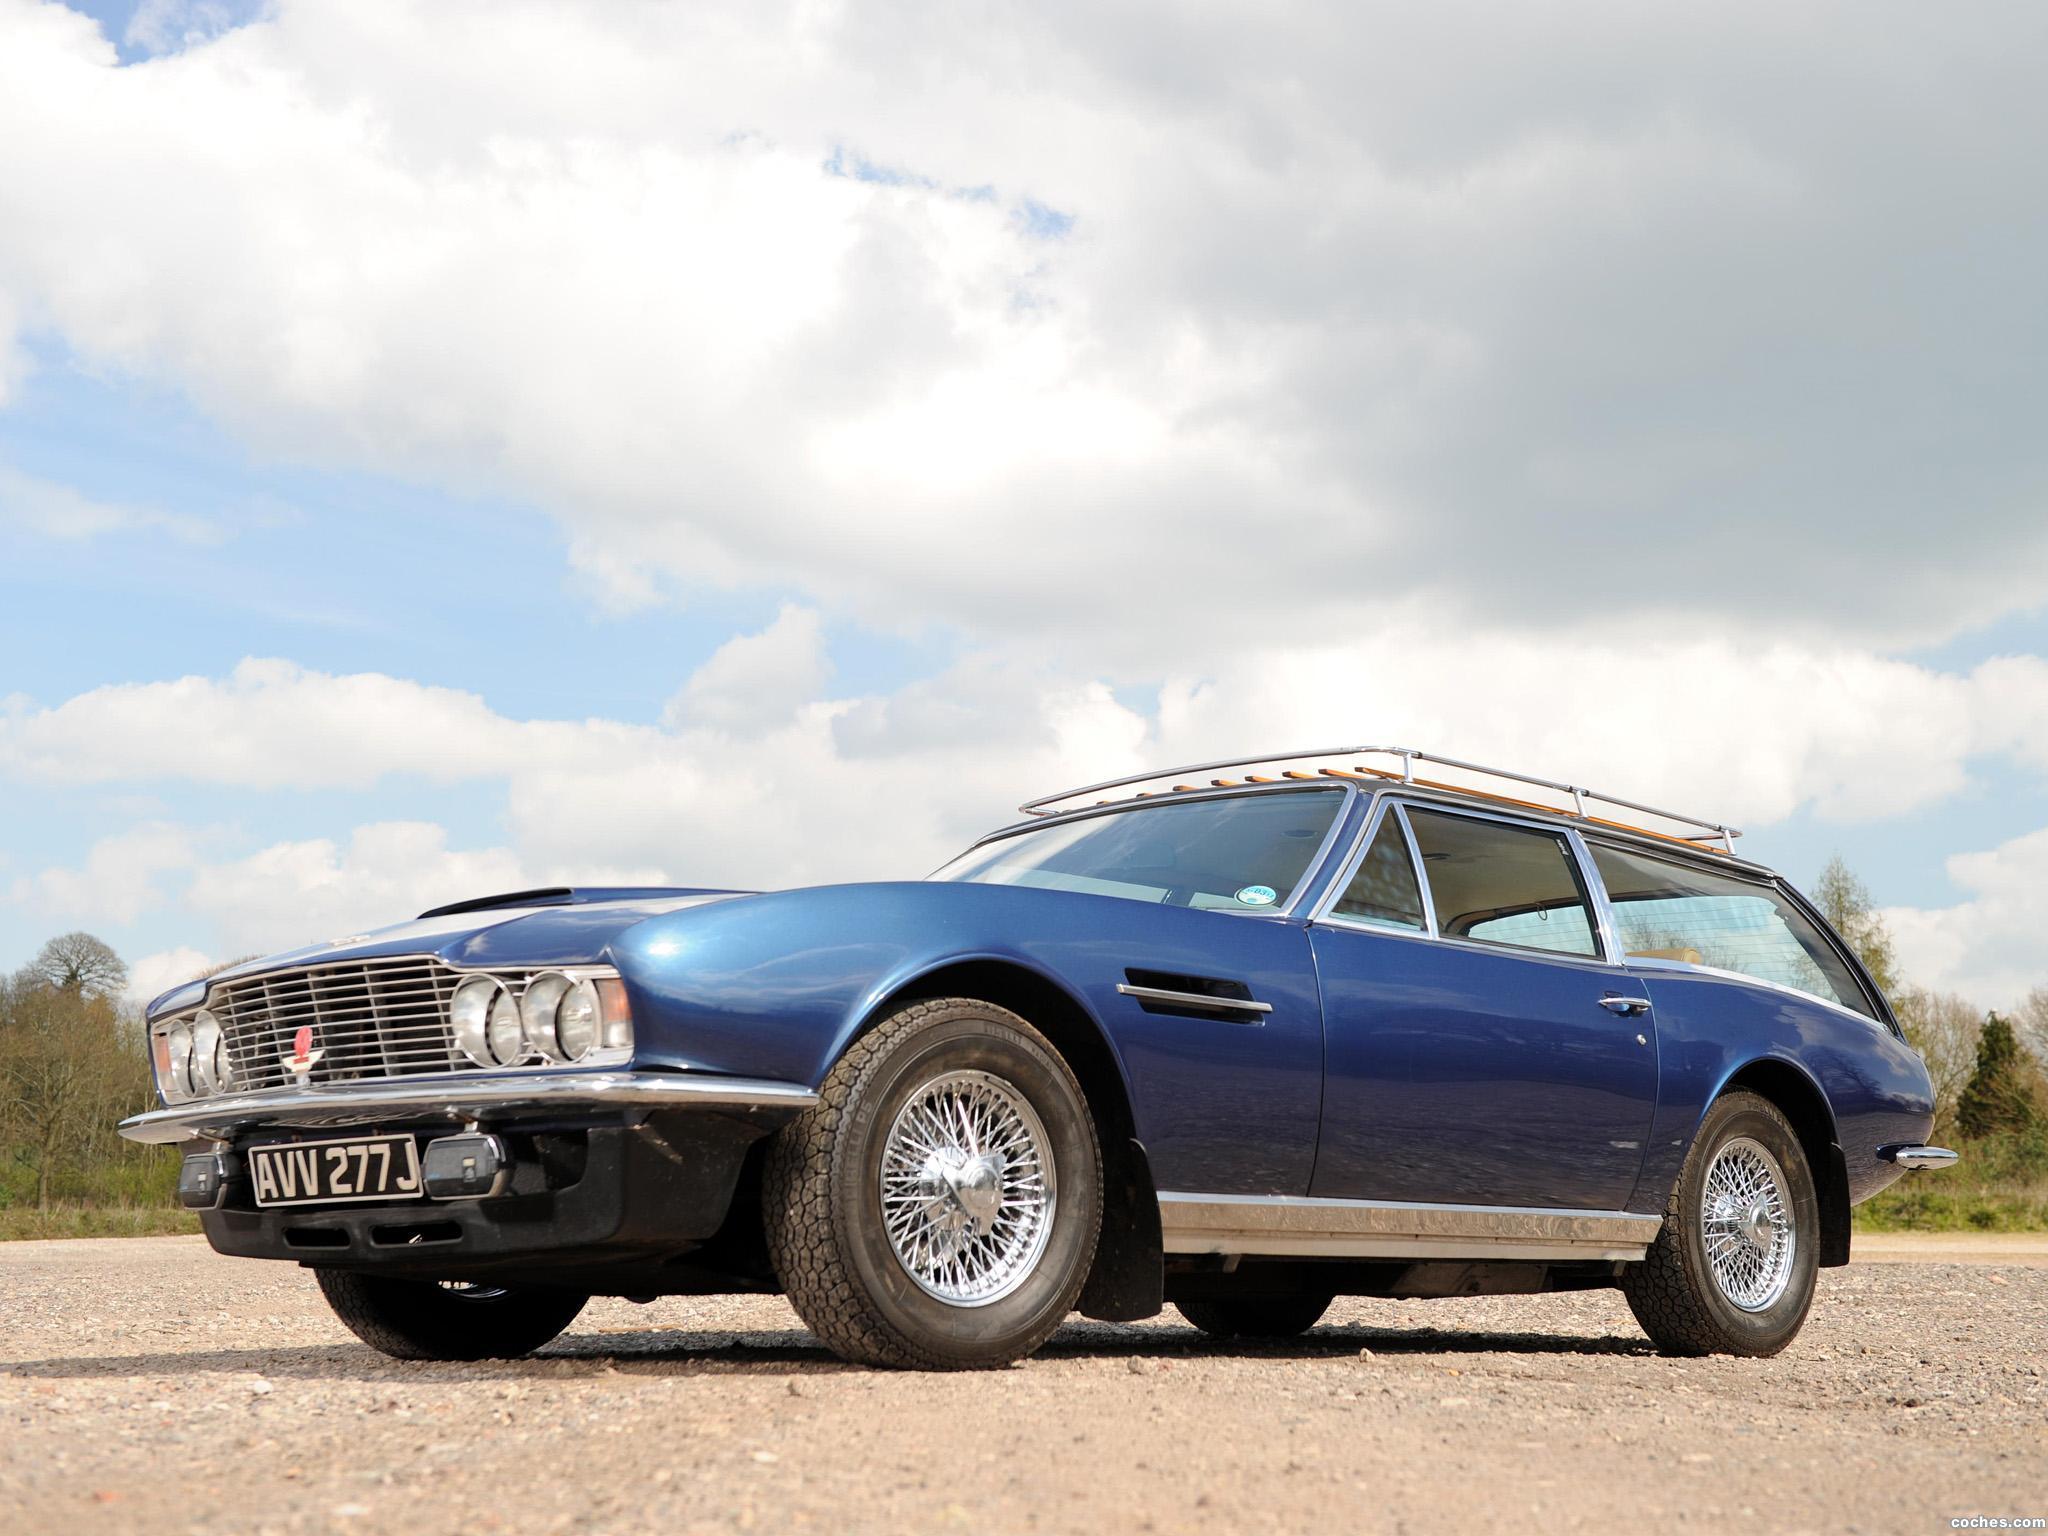 Foto 0 de Aston Martin DBS Estate by FLM Panelcraft 1971